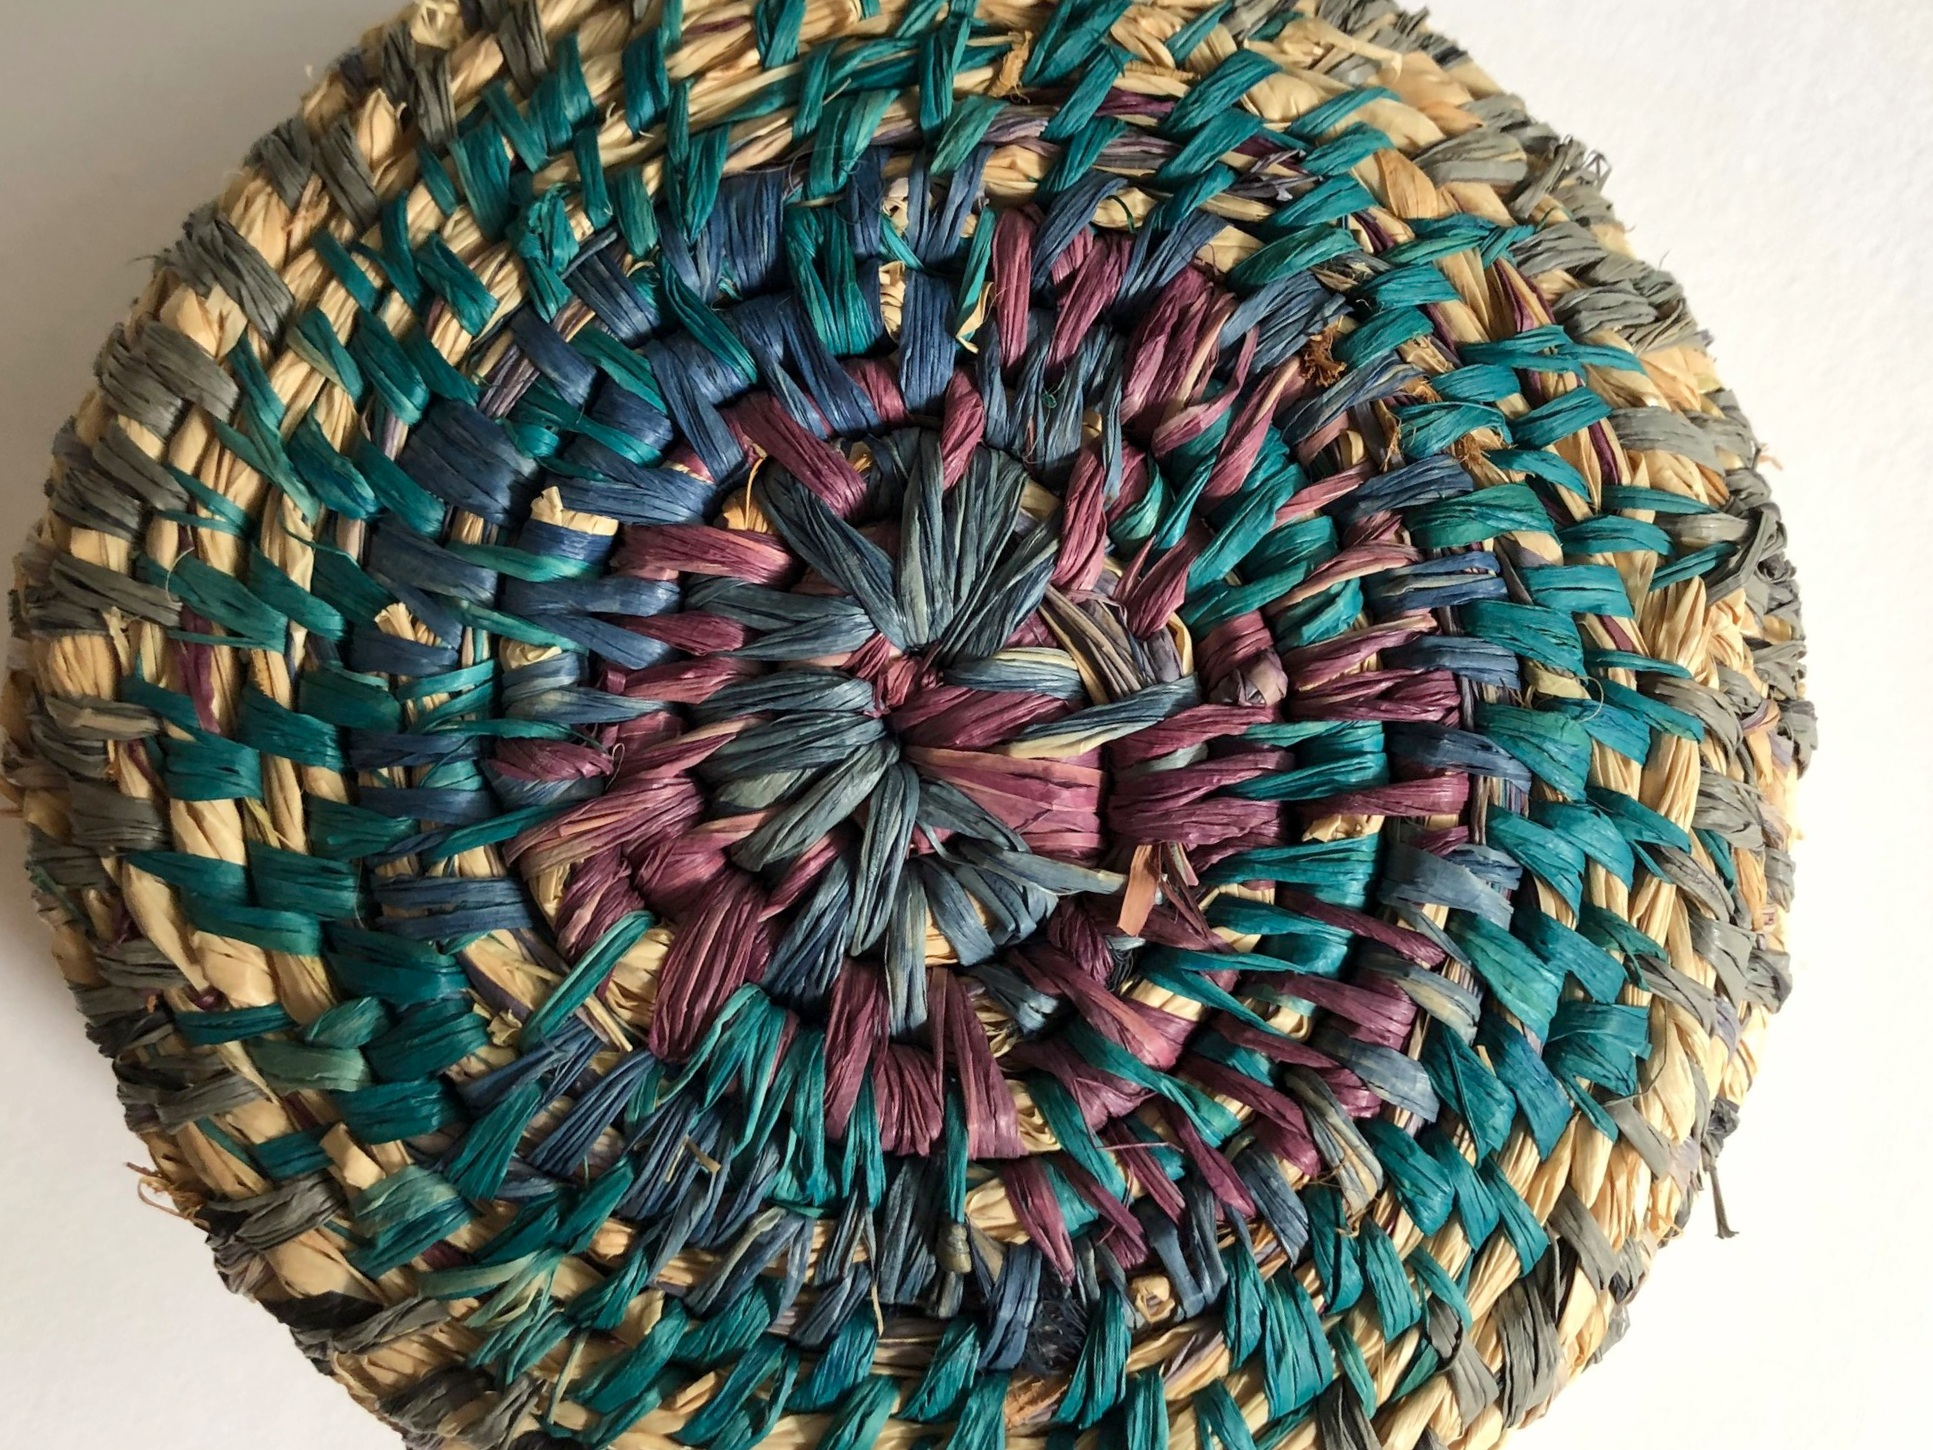 Raffia Coil Weaving - Hand dyed Raffia